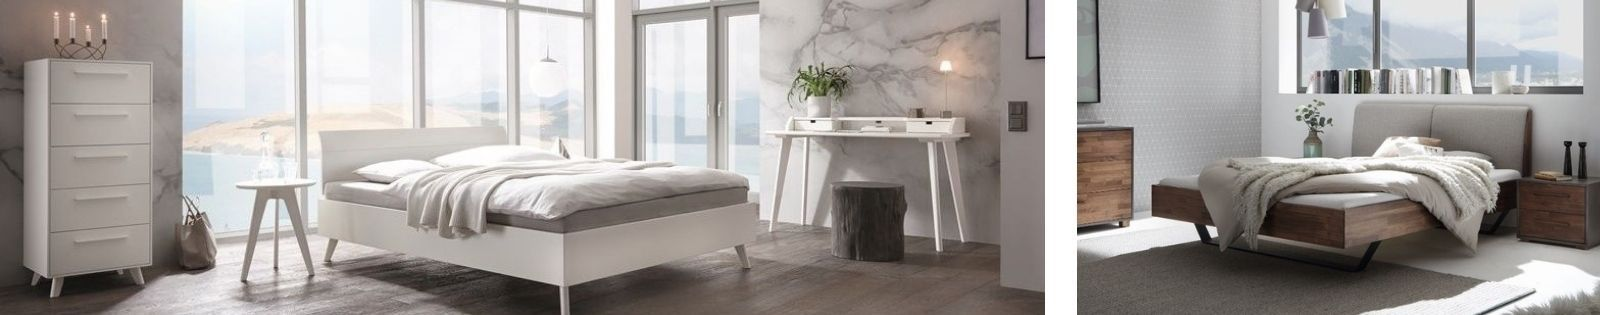 HASENA : GAMME MODERNO. Meubles pour votre chambre. Lotuséa.